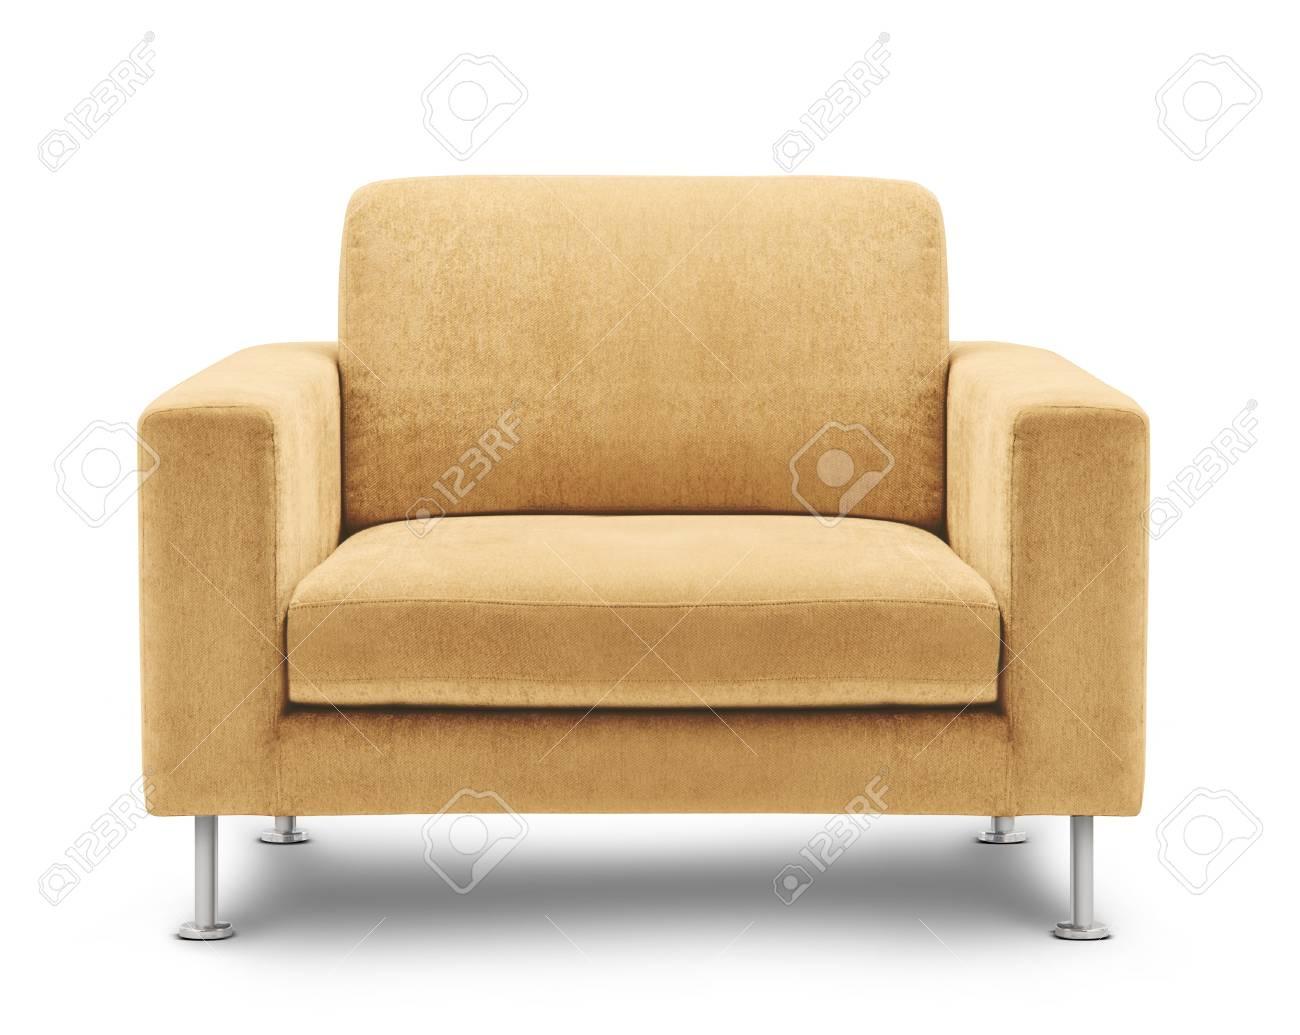 sofa furniture isolated on white background Stock Photo - 12319893